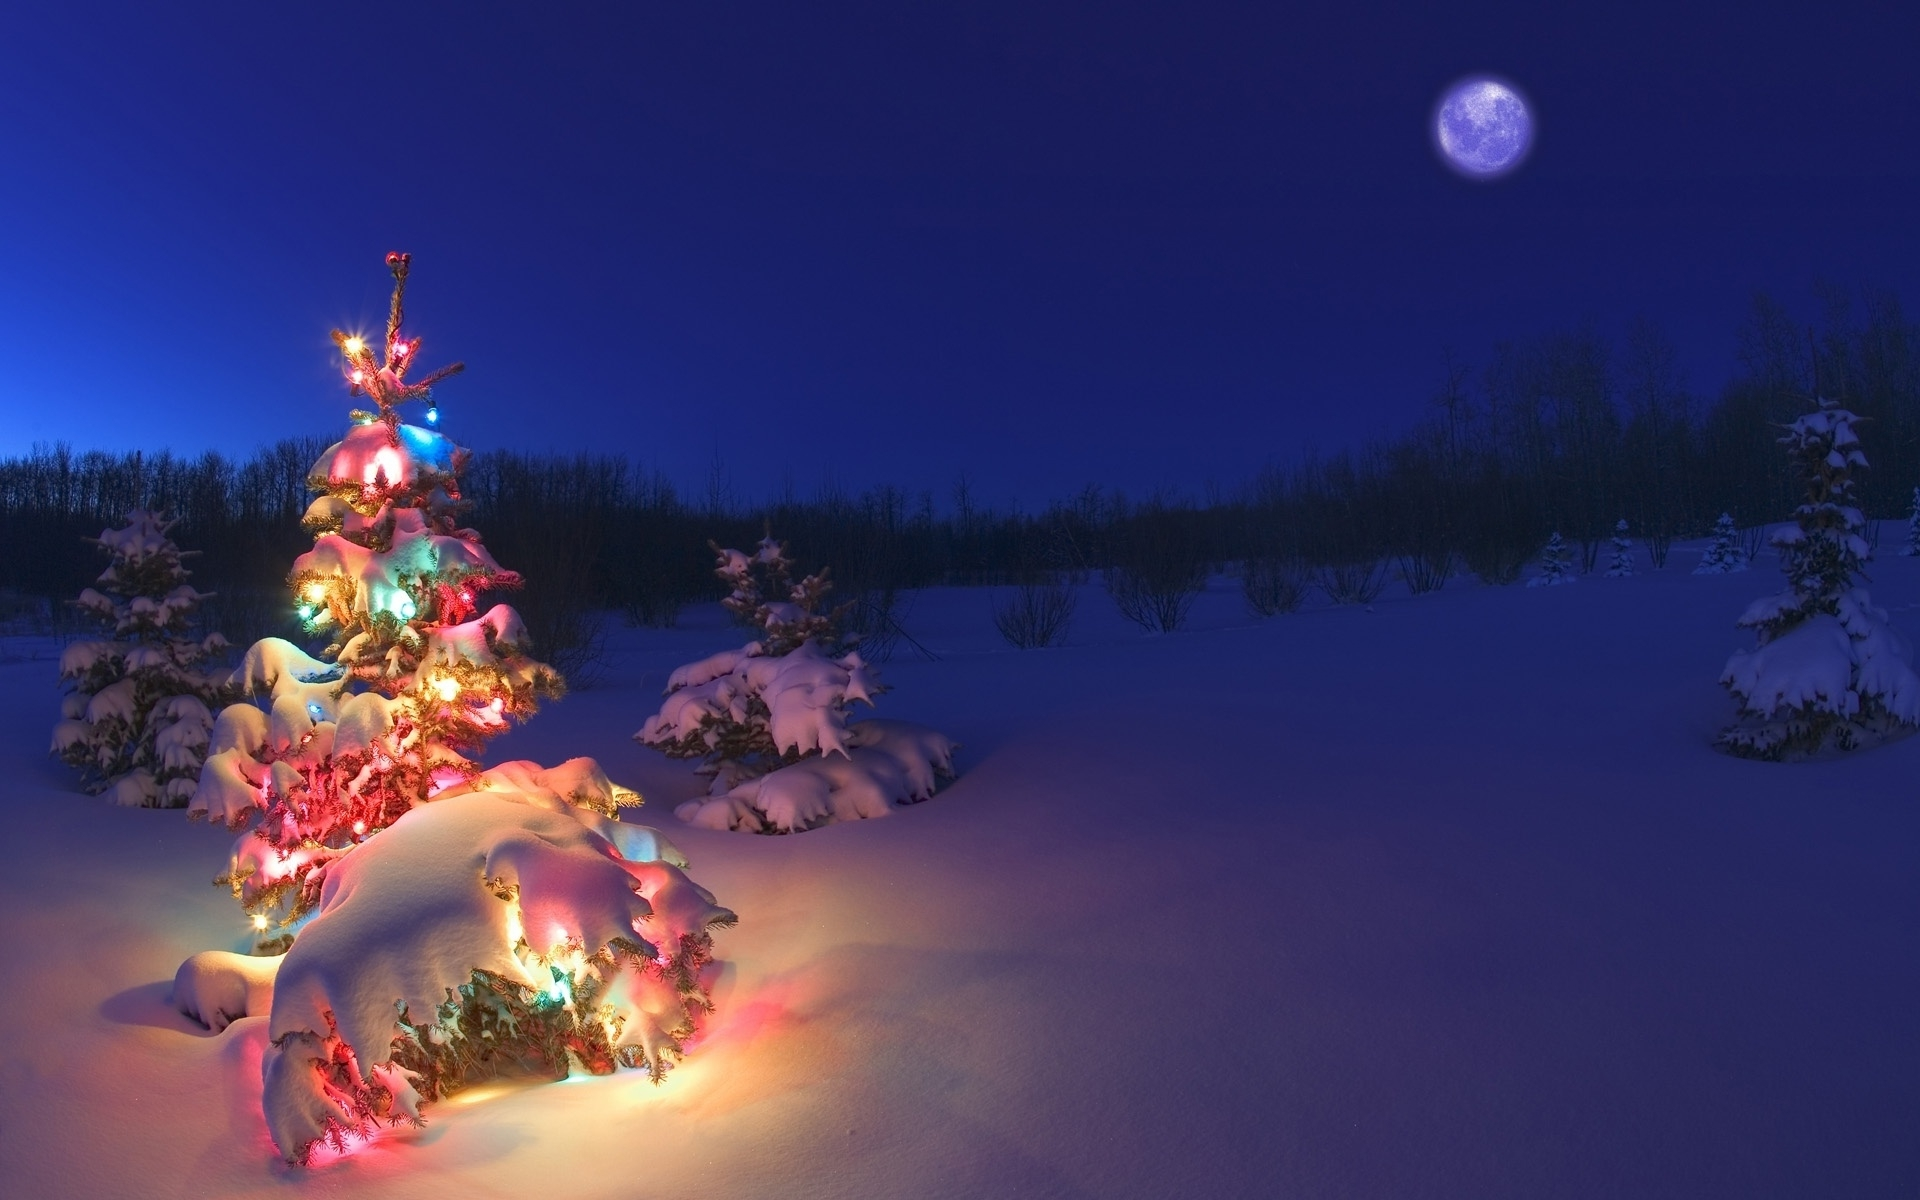 christmas-tree-lights-snow-wallpaper-hd - wallpaper.wiki